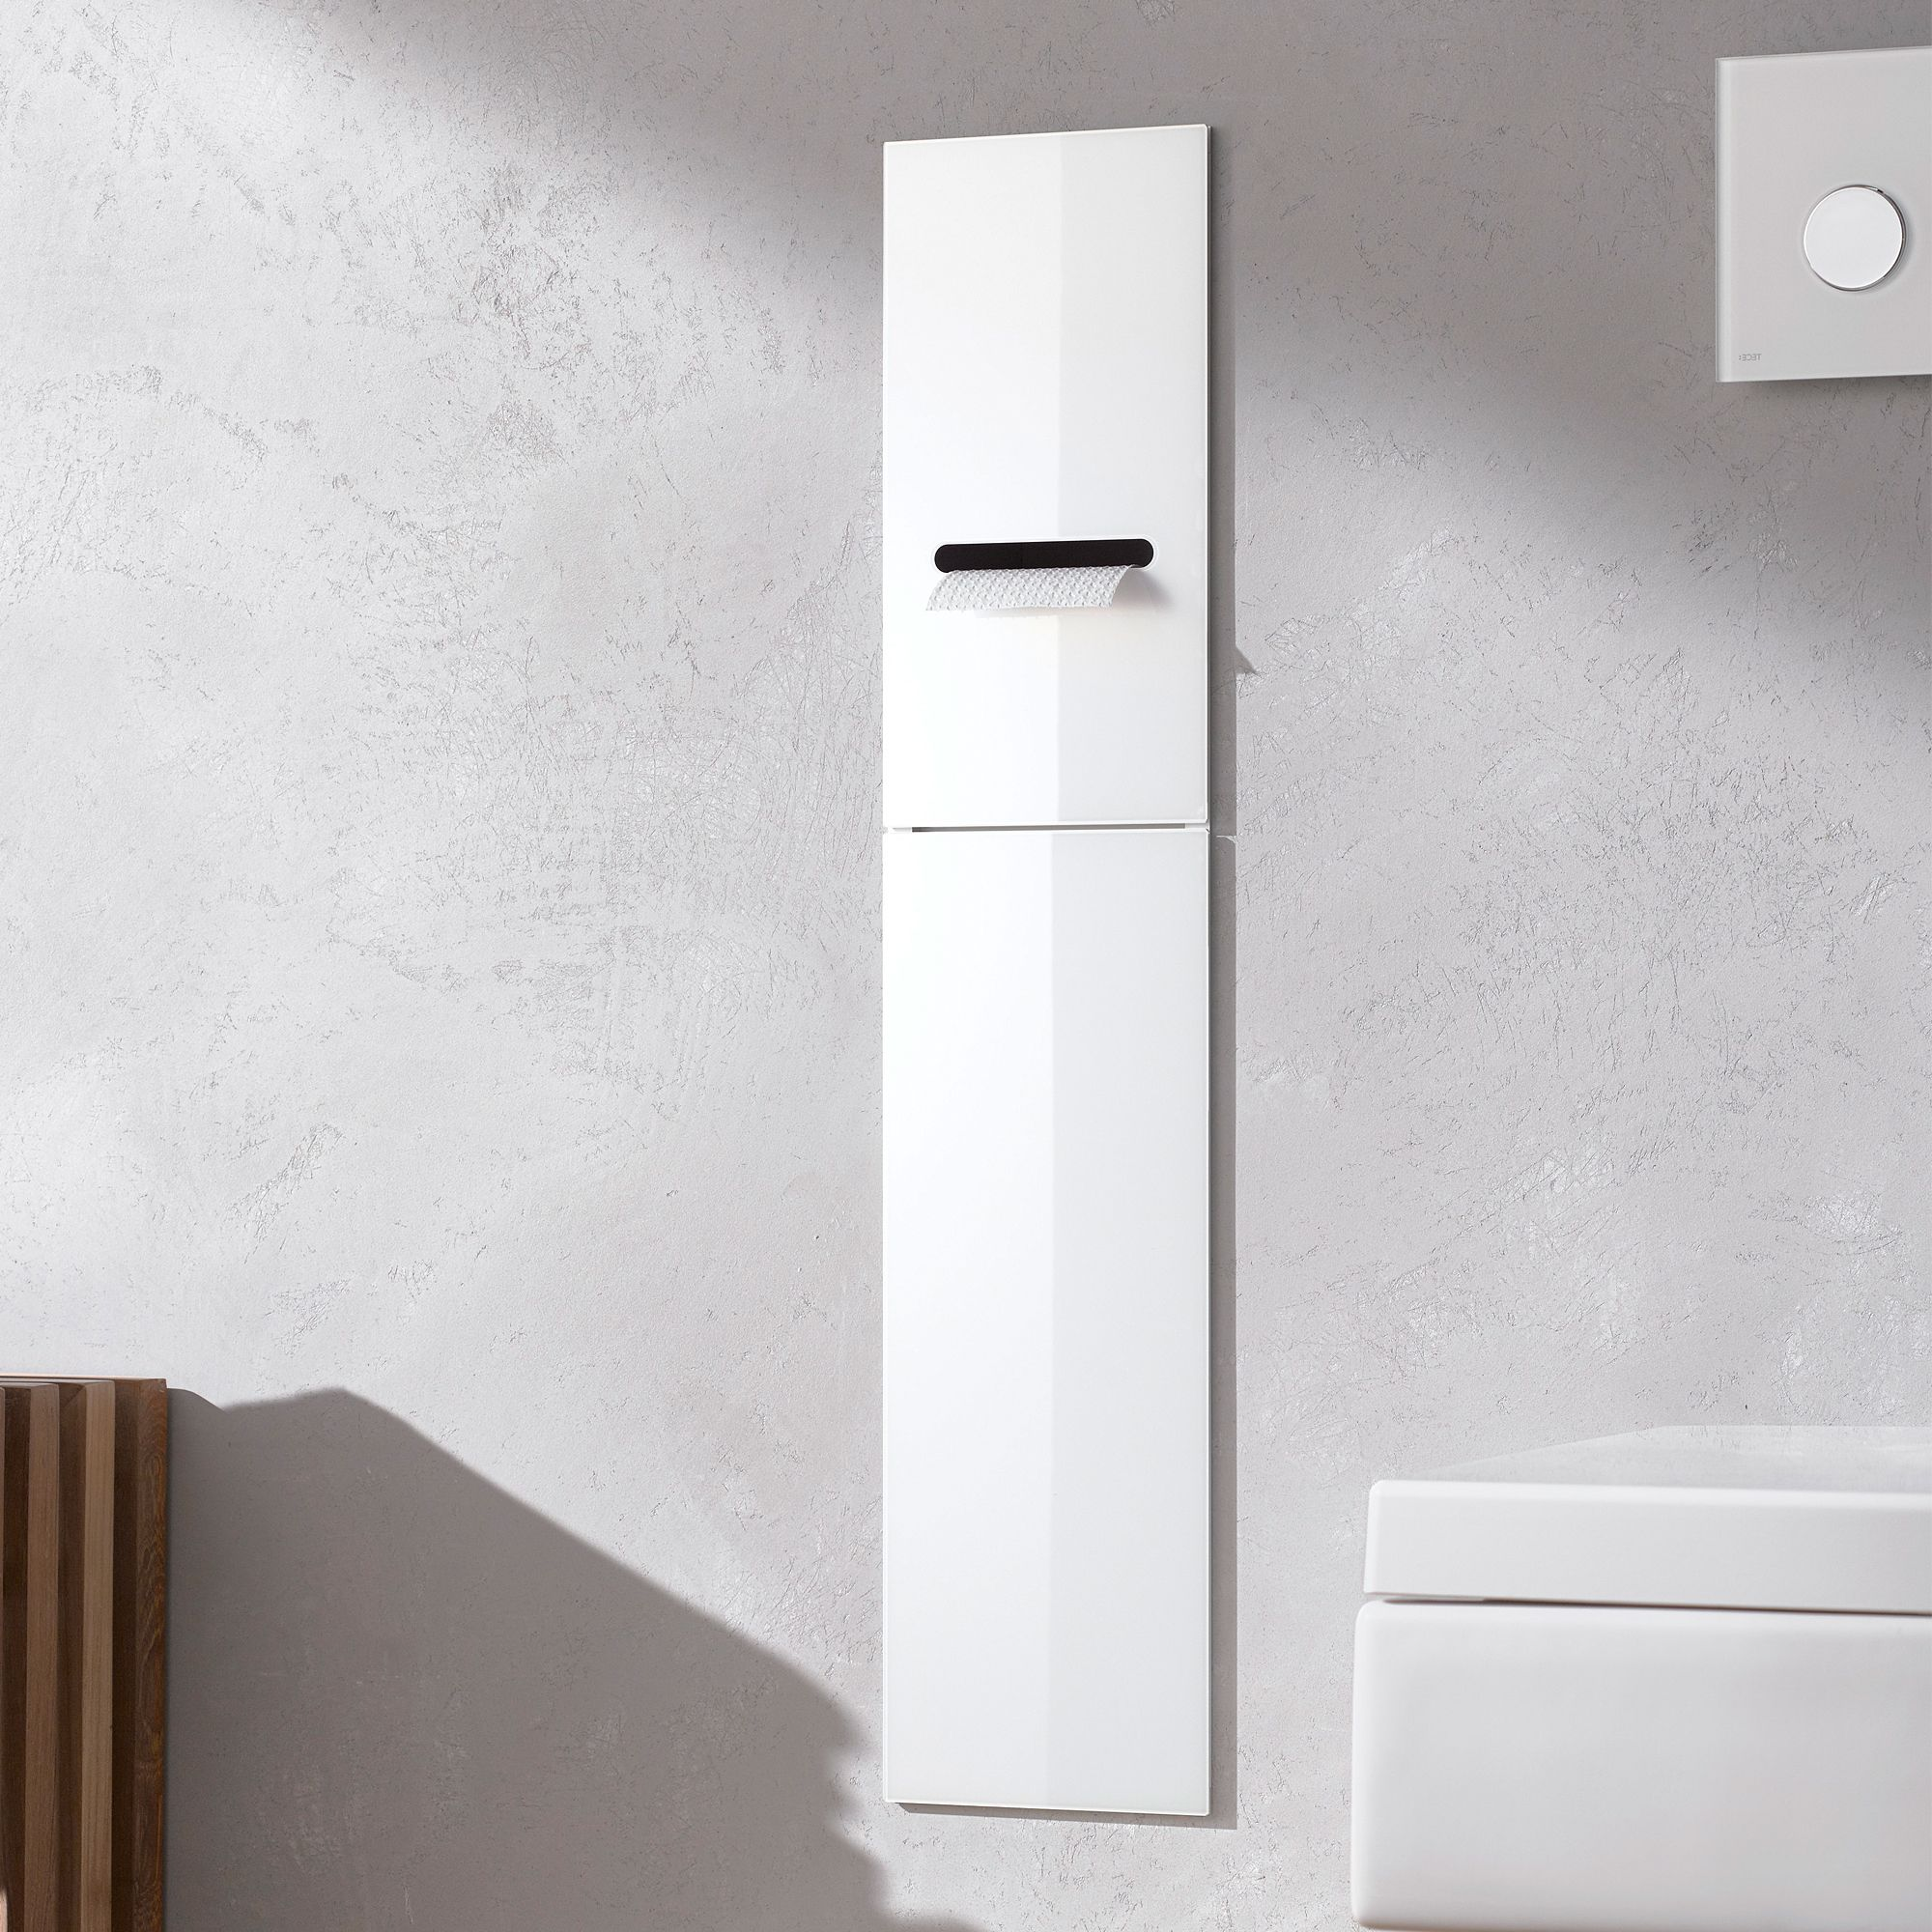 Toilettenpapierhalter Unterputz Emco Asis 2 0 Unterputz